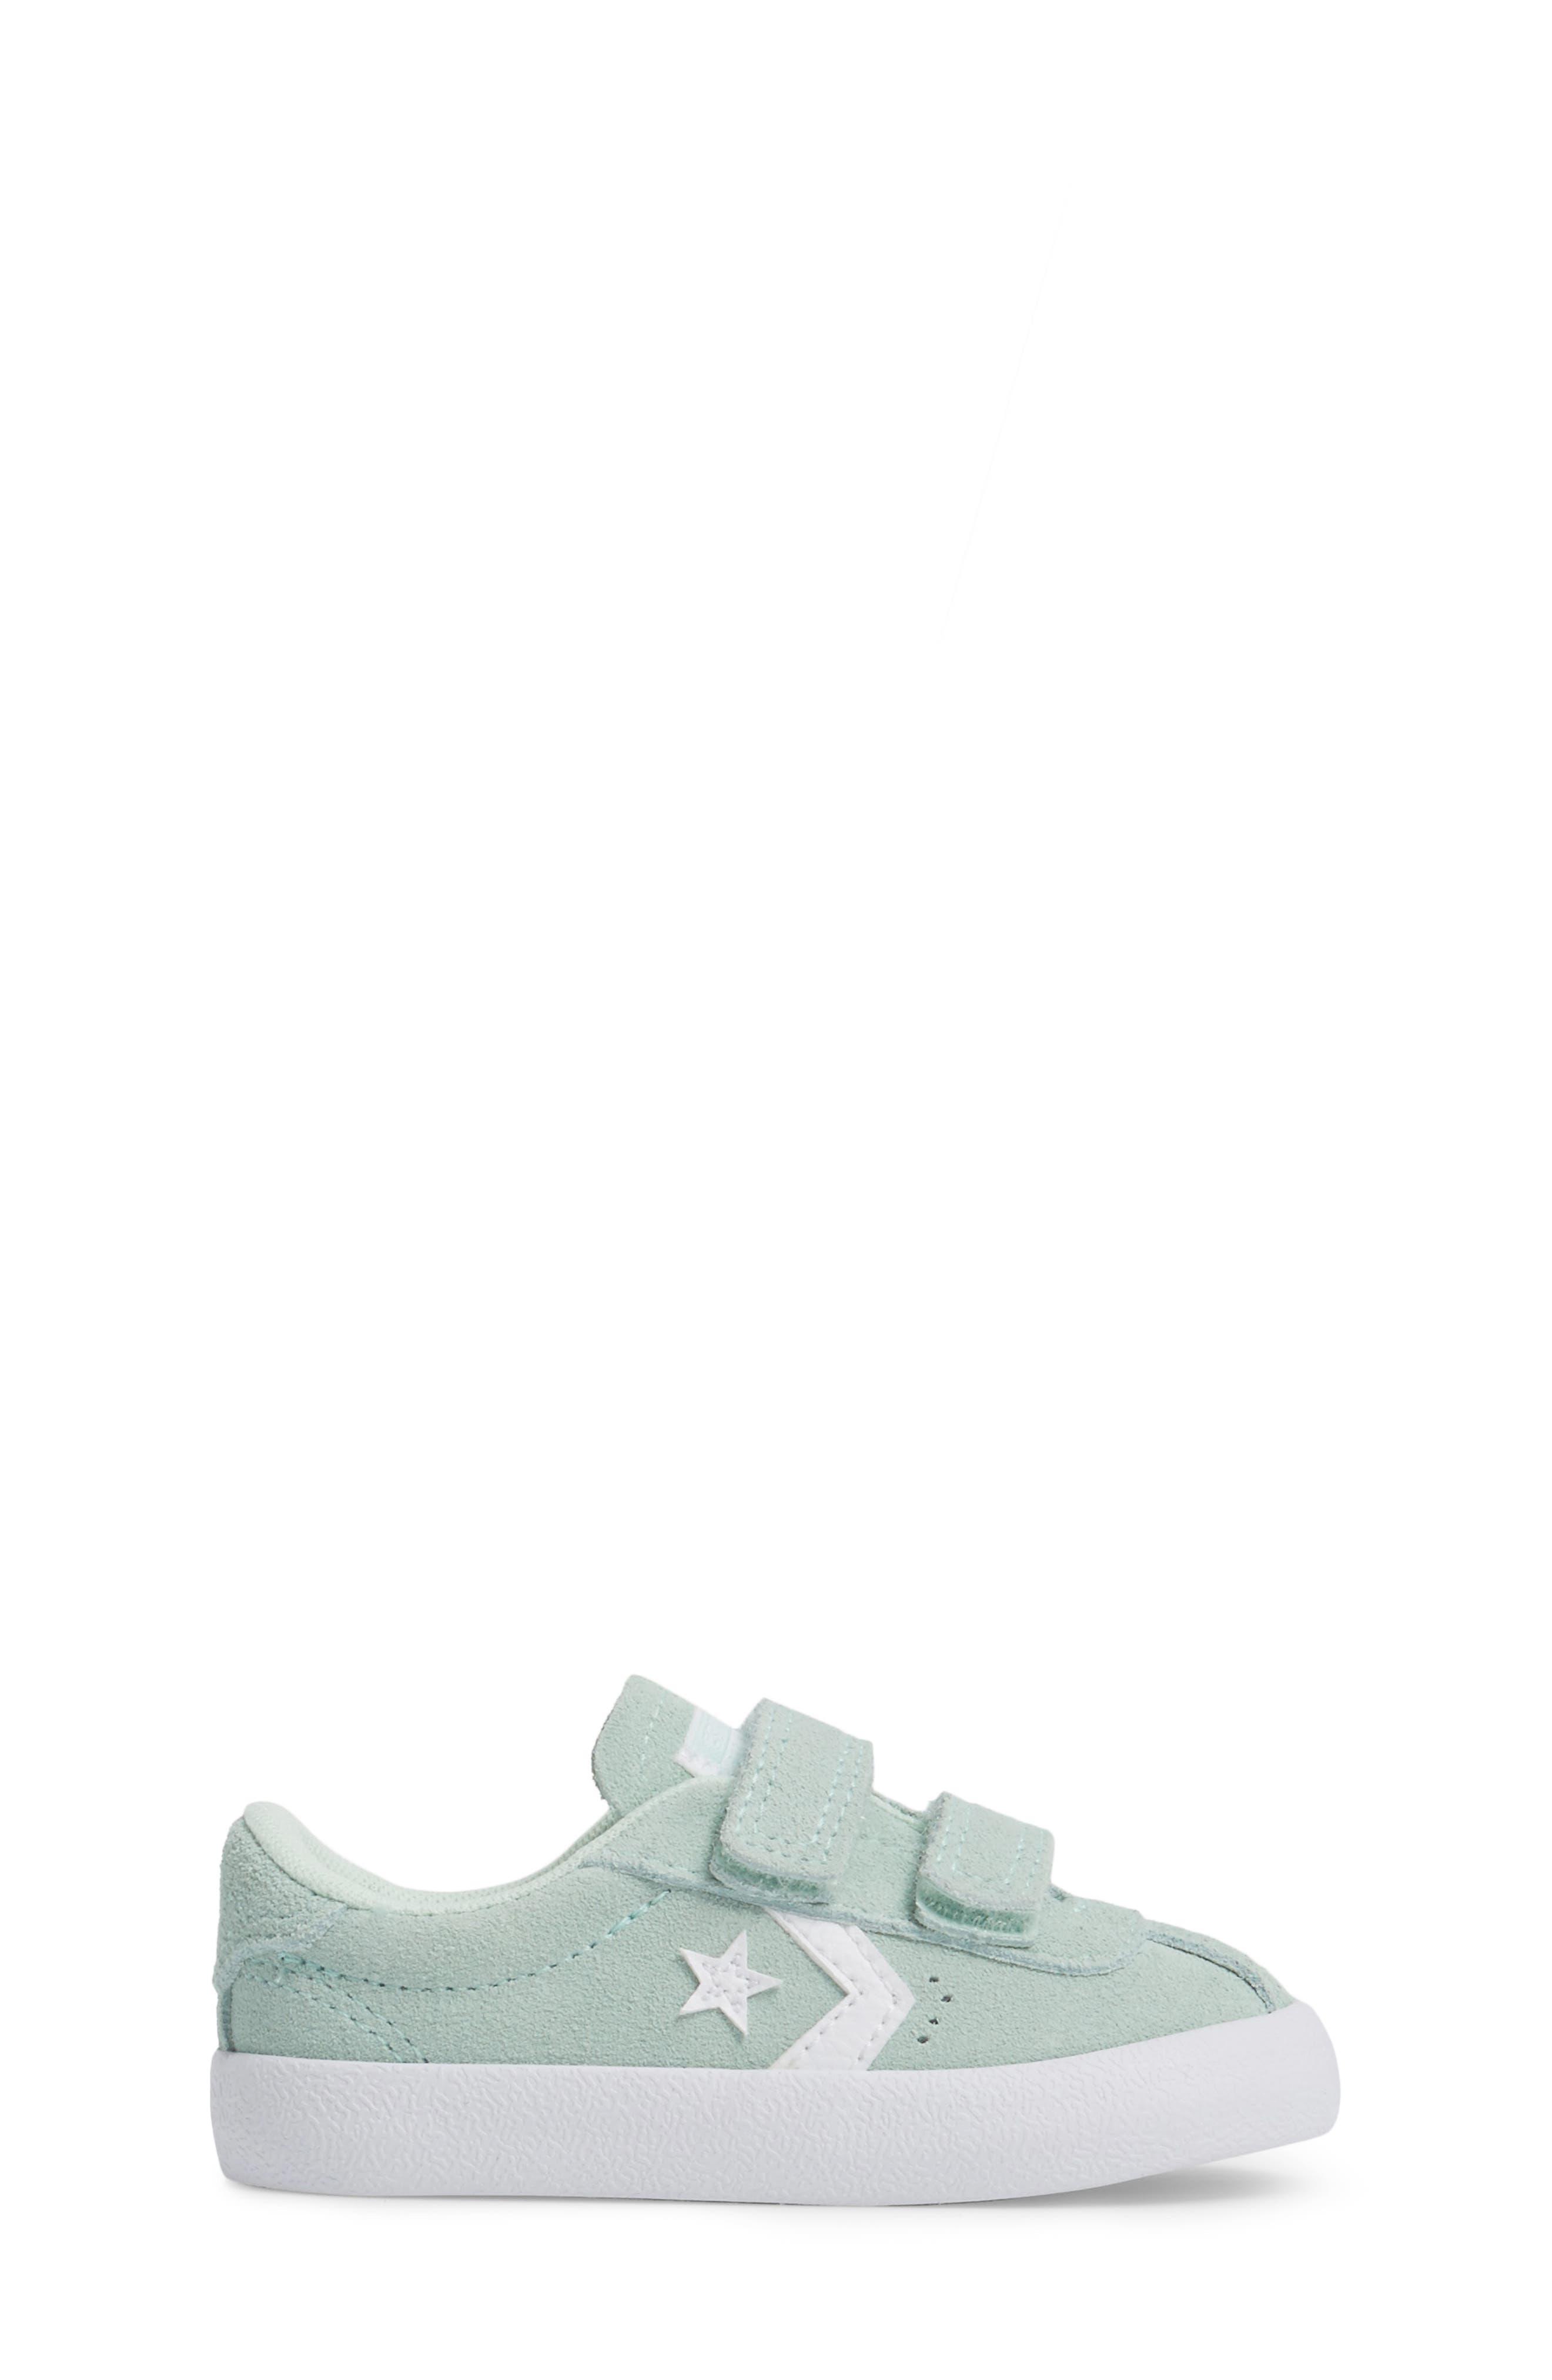 Breakpoint Sneaker,                             Alternate thumbnail 3, color,                             300